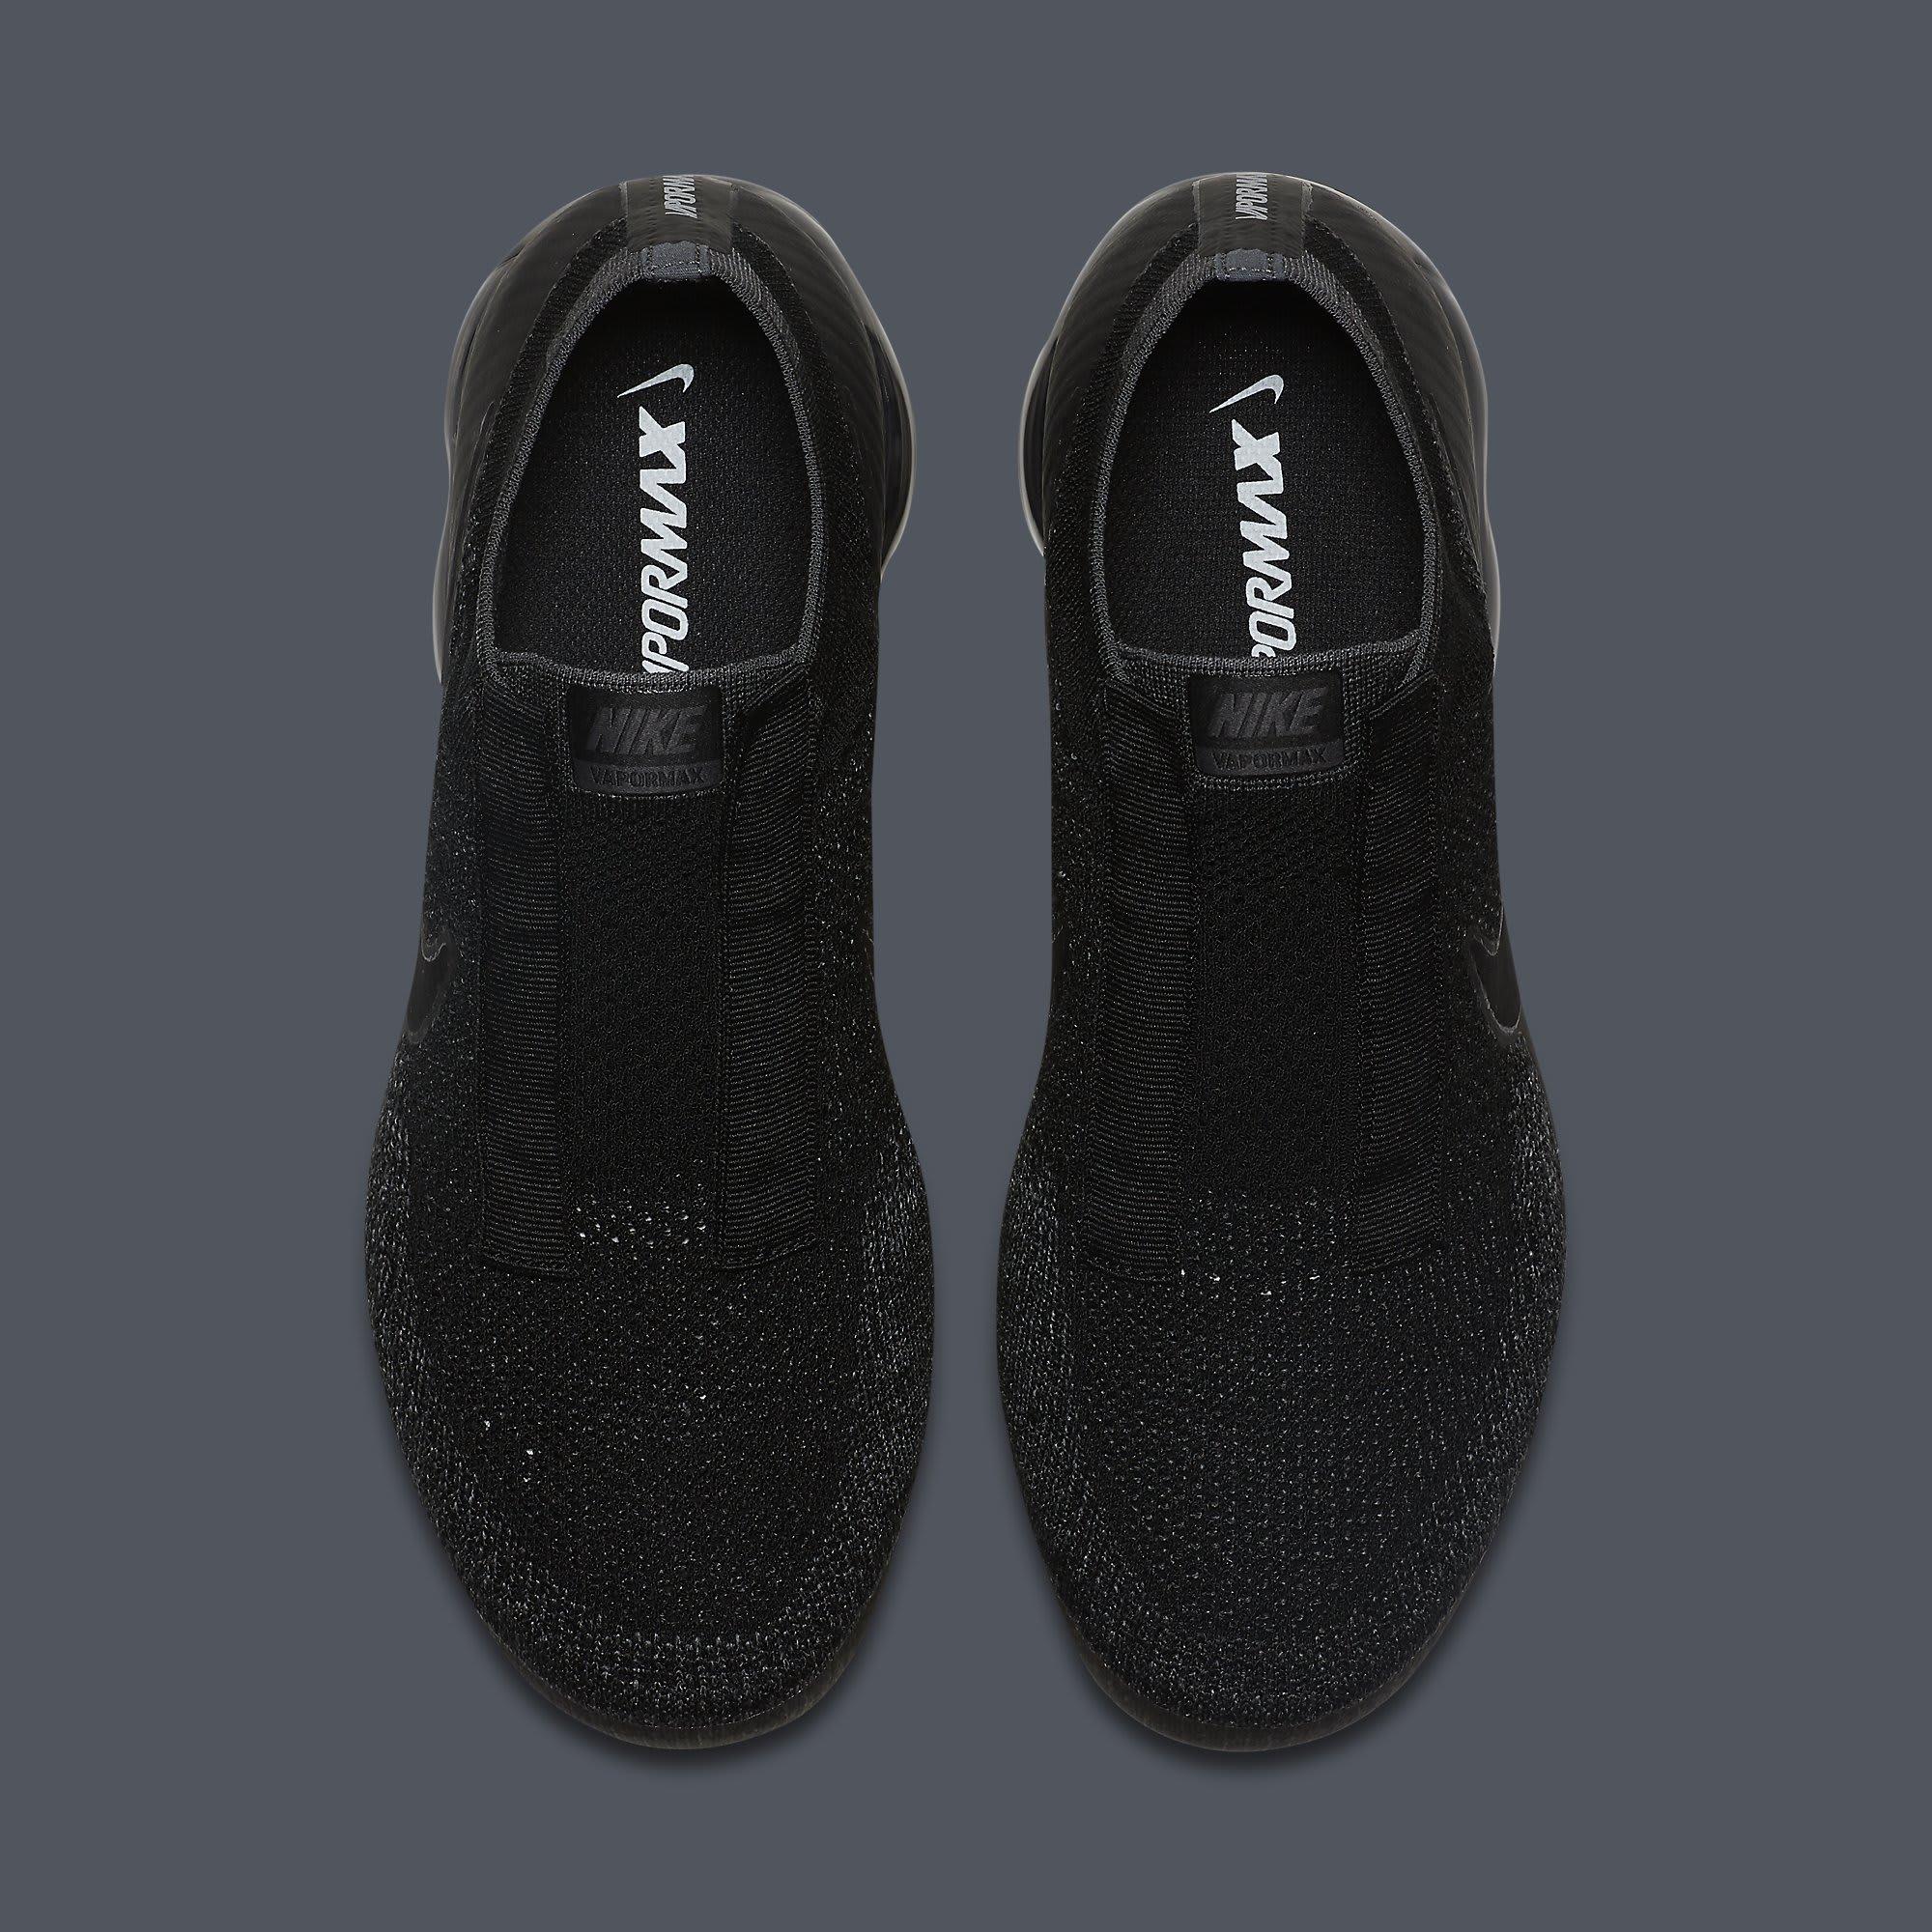 Nike Air VaporMax Laceless Black Release Date Top AQ0581-001